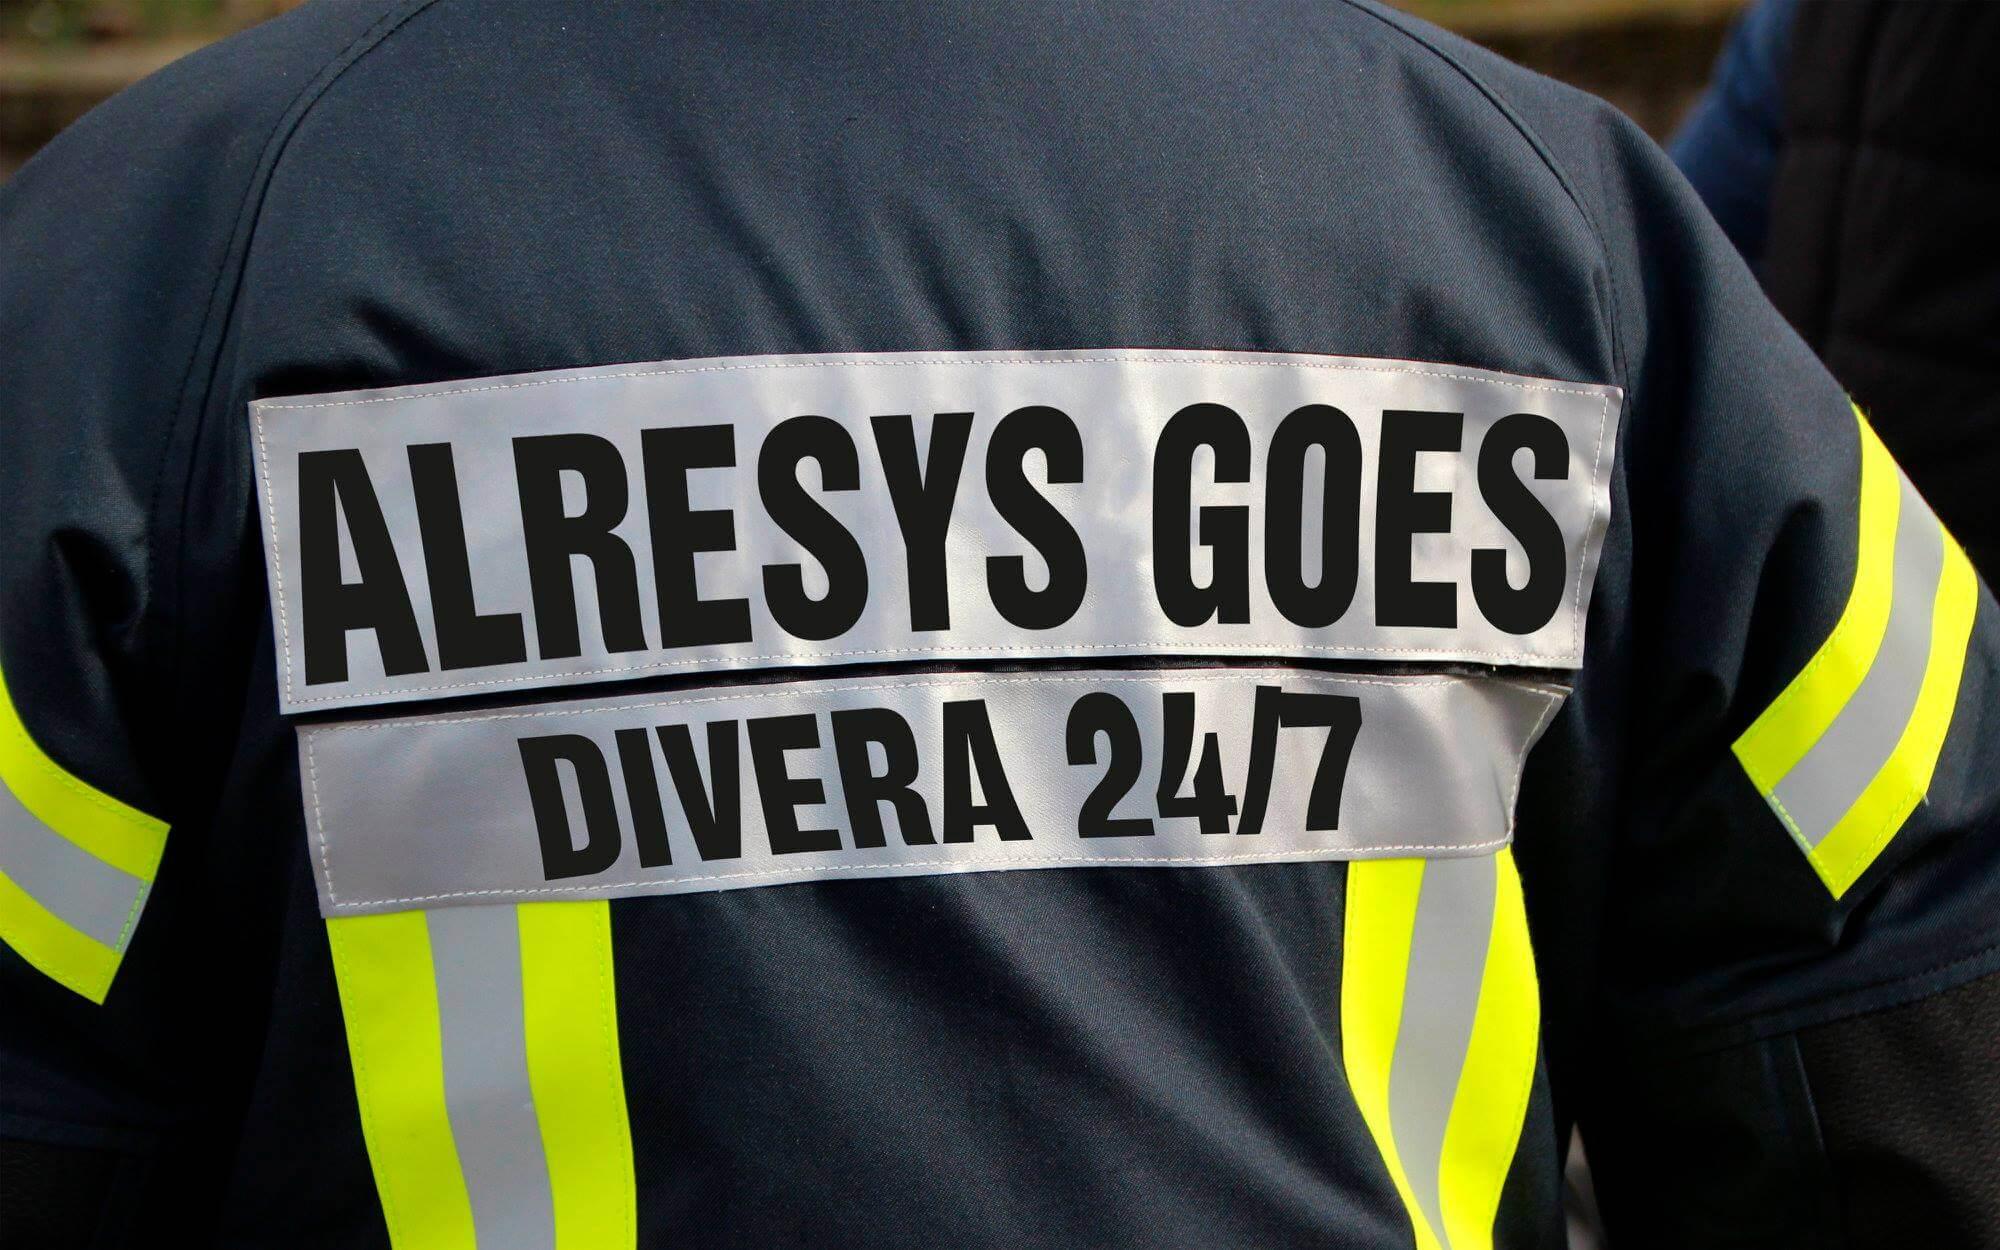 DIVERA 24/7 übernimmt die App Alresys - Alarm Response System